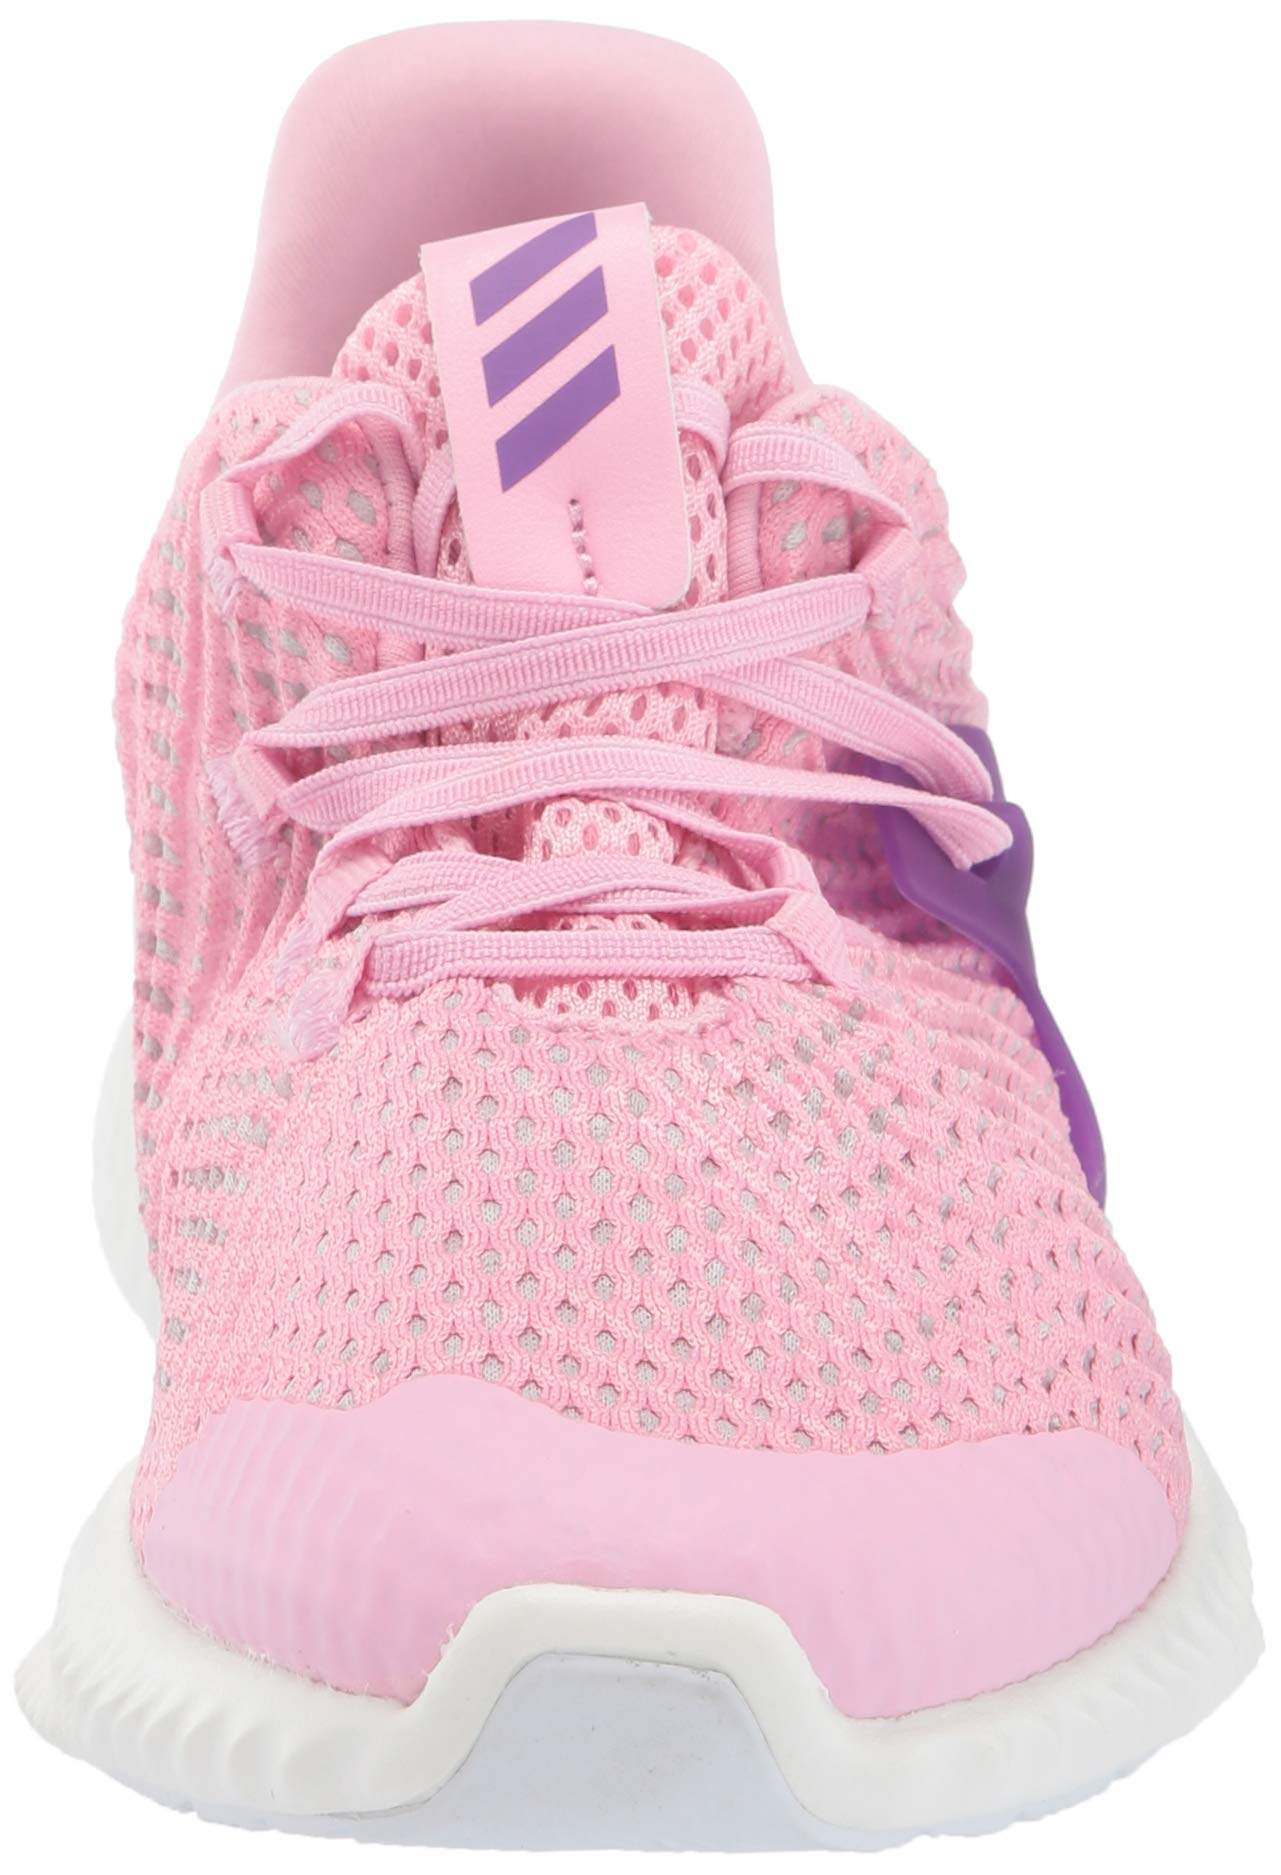 Adidas Kids Alphabounce Instinct, true pink/active purple/cloud white 2.5 M US Little Kid by adidas (Image #4)